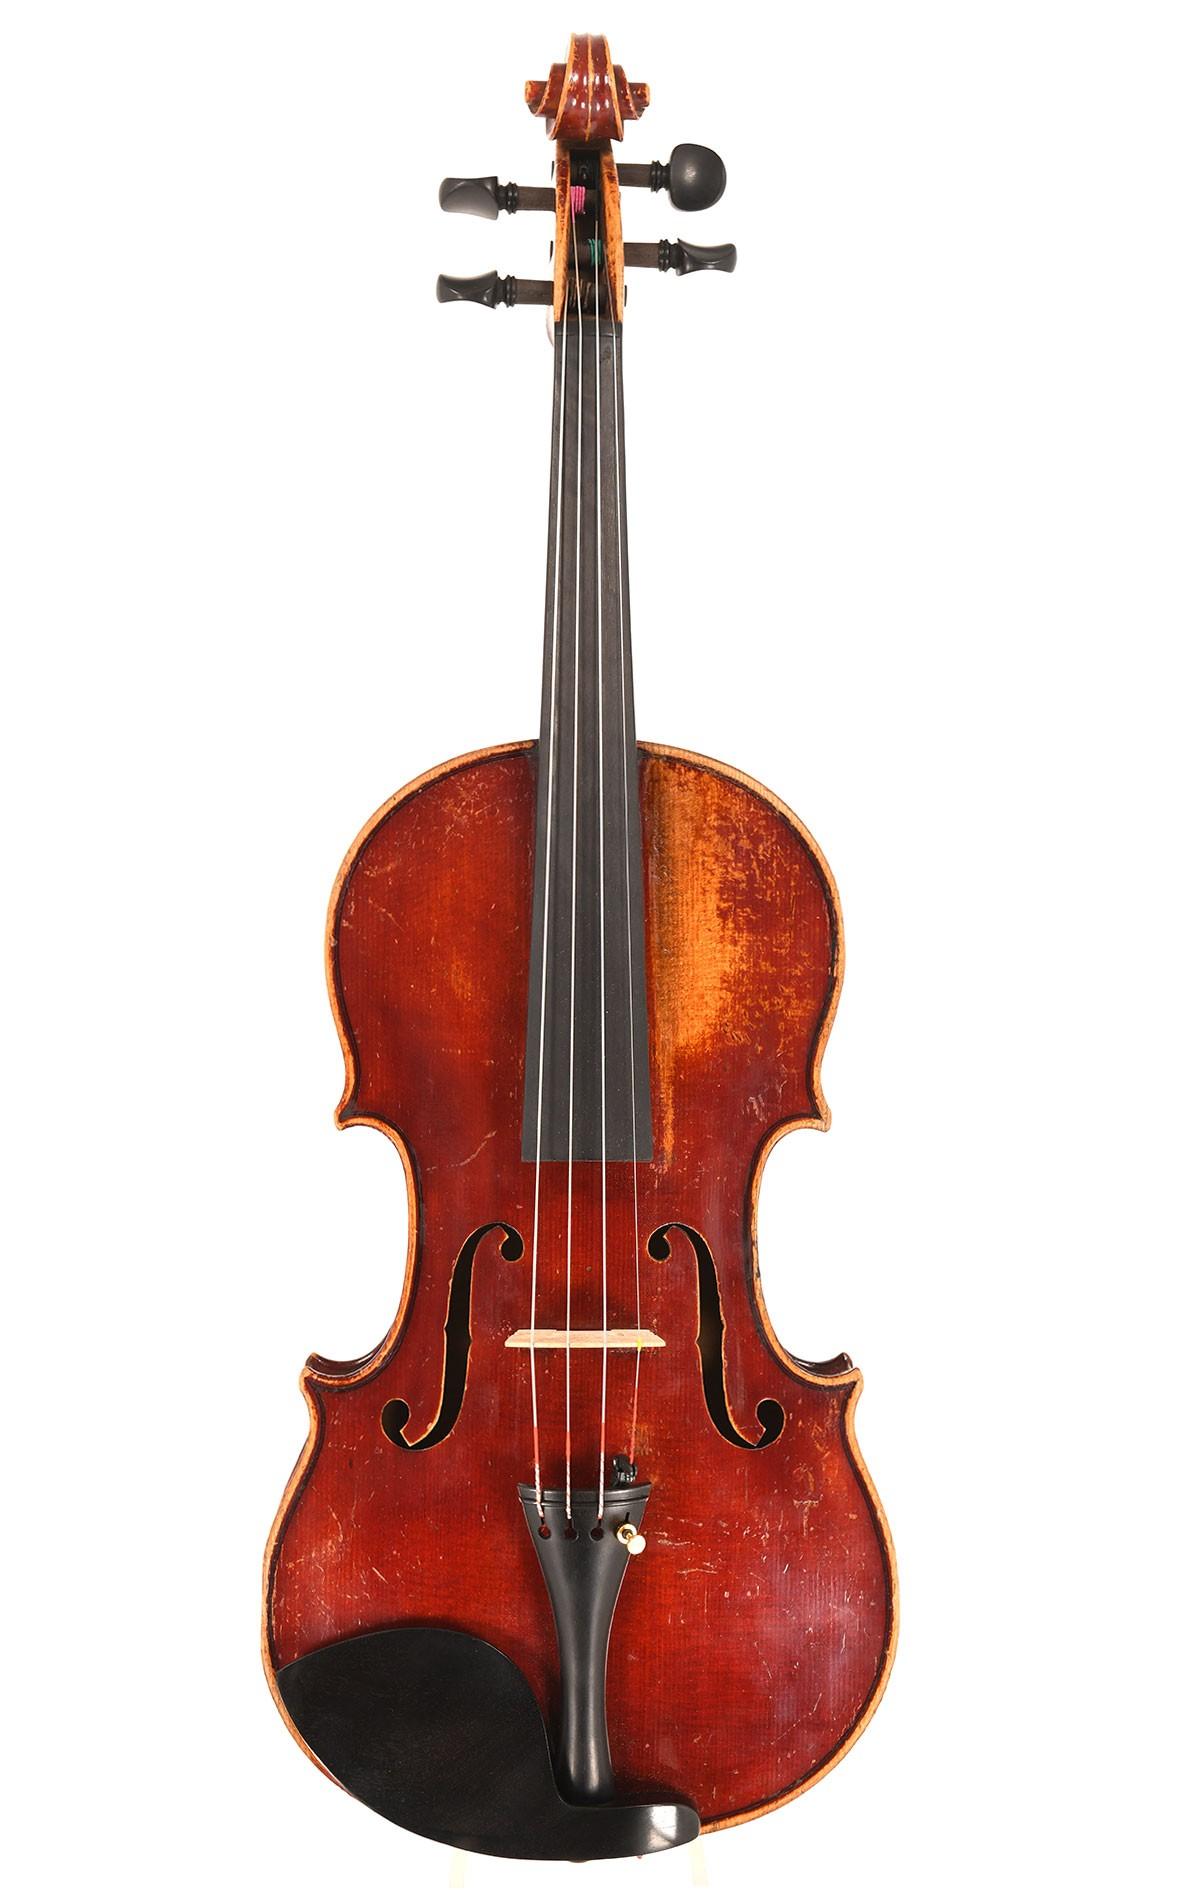 French master violin , probably Maucotel Mirecourt